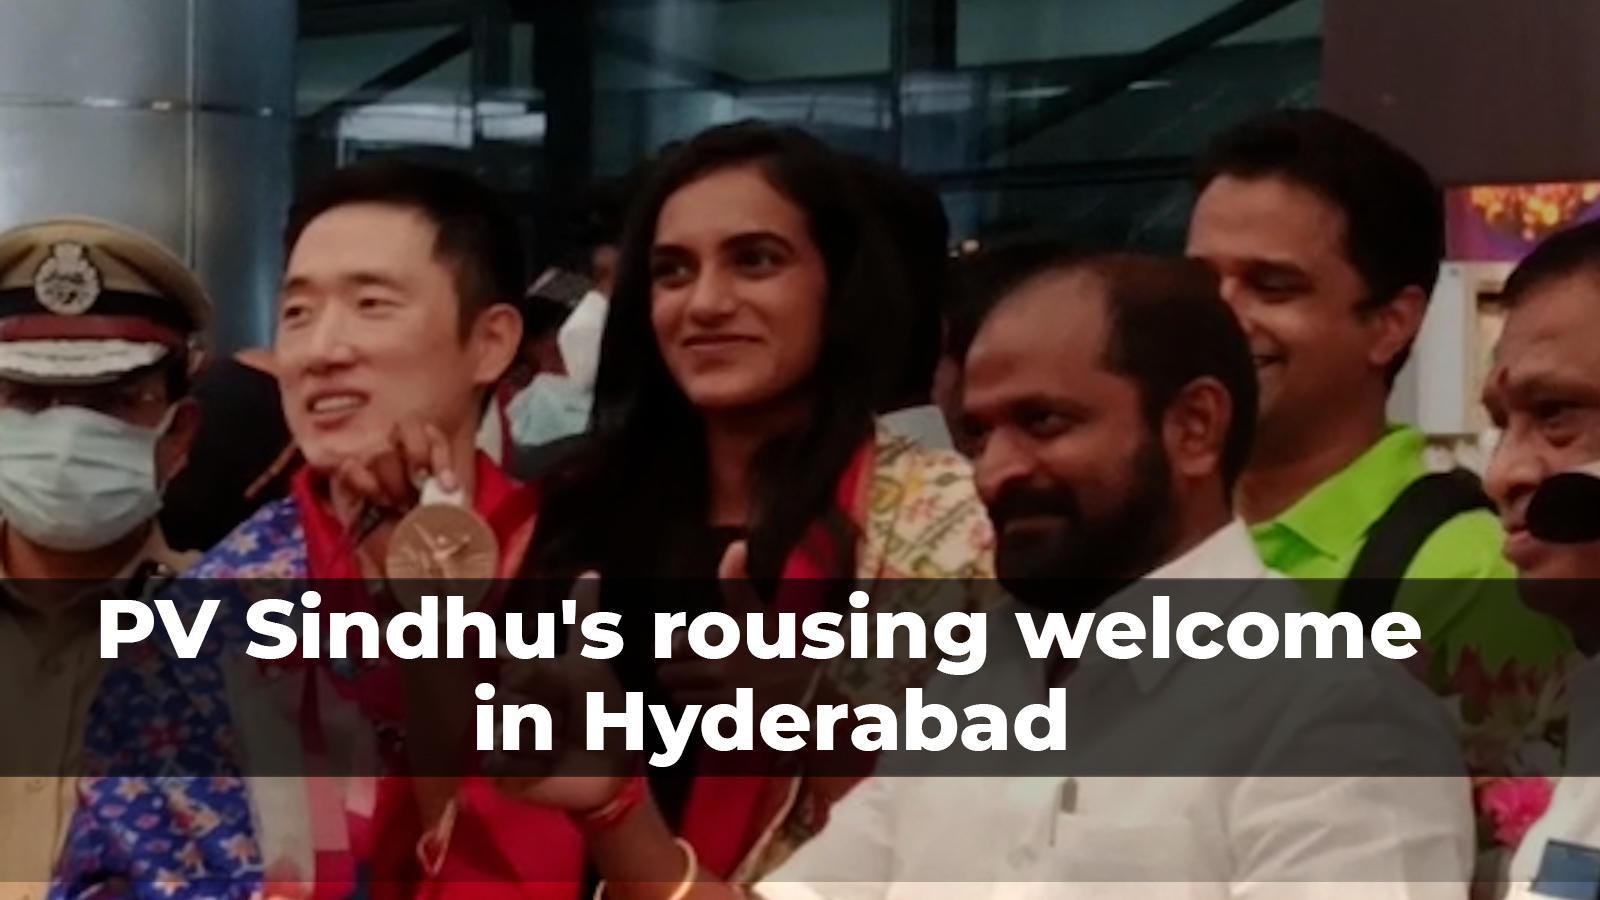 tokyo-olympics-bronze-medallist-pv-sindhu-receives-grand-welcome-at-rajiv-gandhi-international-airport-in-hyderabad